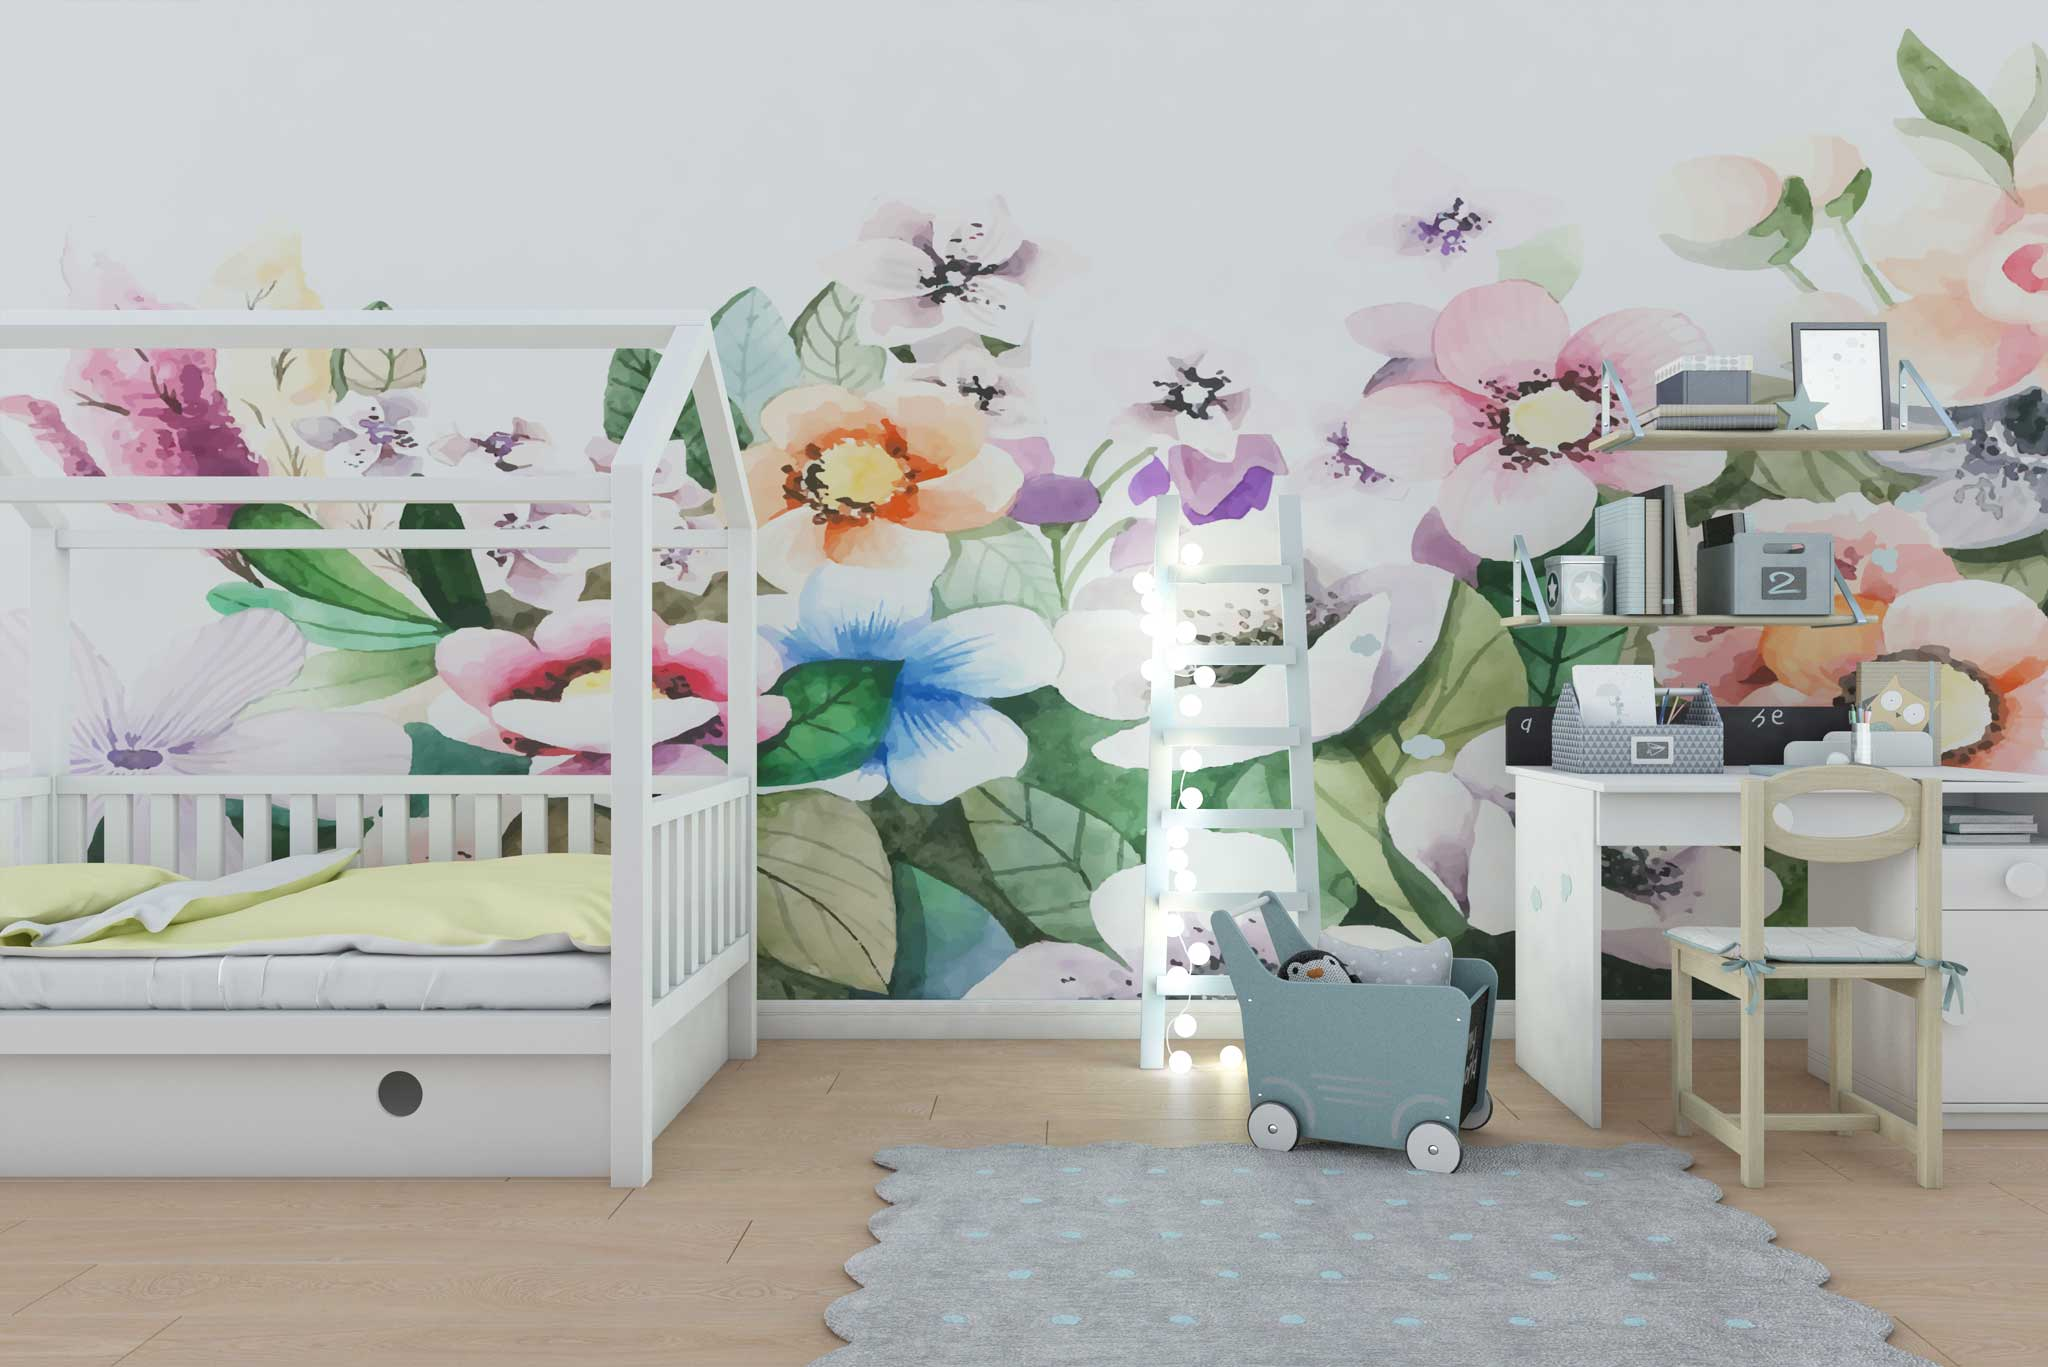 tapet-fototapet-design-personalizat-customizabil-comanda-special-camera-dormitor-copii-model-motiv-floral-flori-pictate-acuarela-fundal-alb-multicolor-pastel